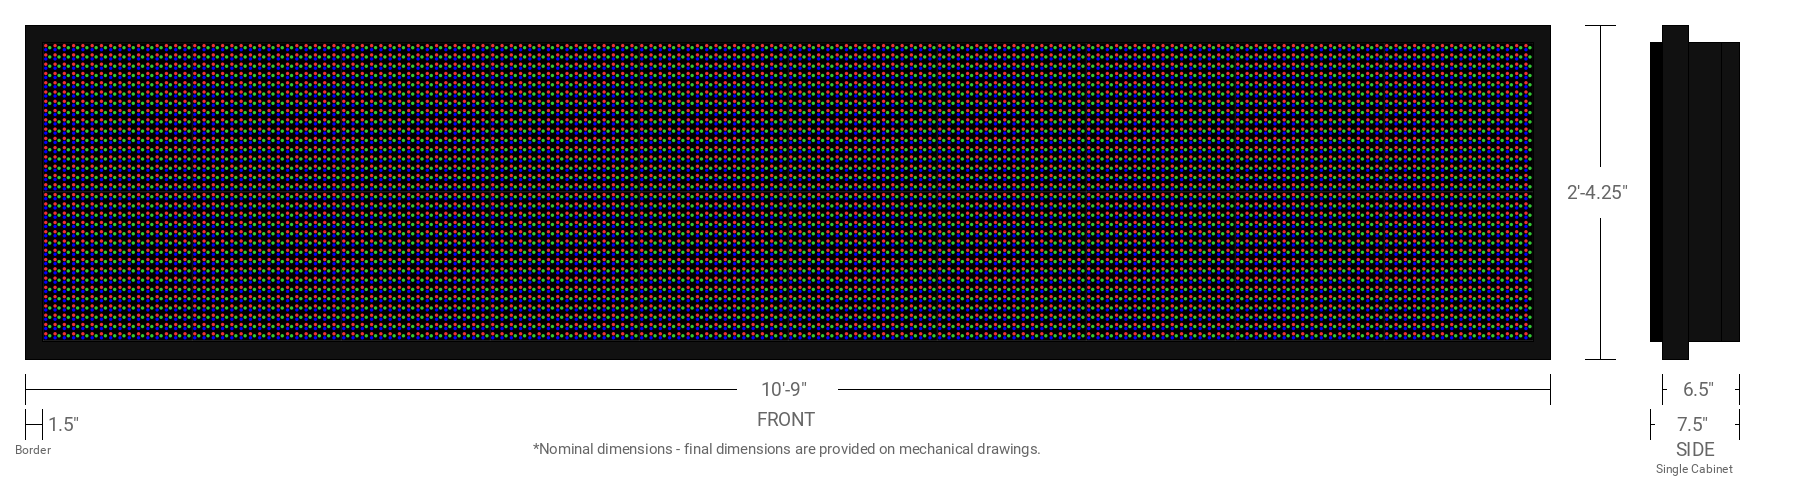 Polaris 20mm 32x160 Single Sided Full Color LED Display